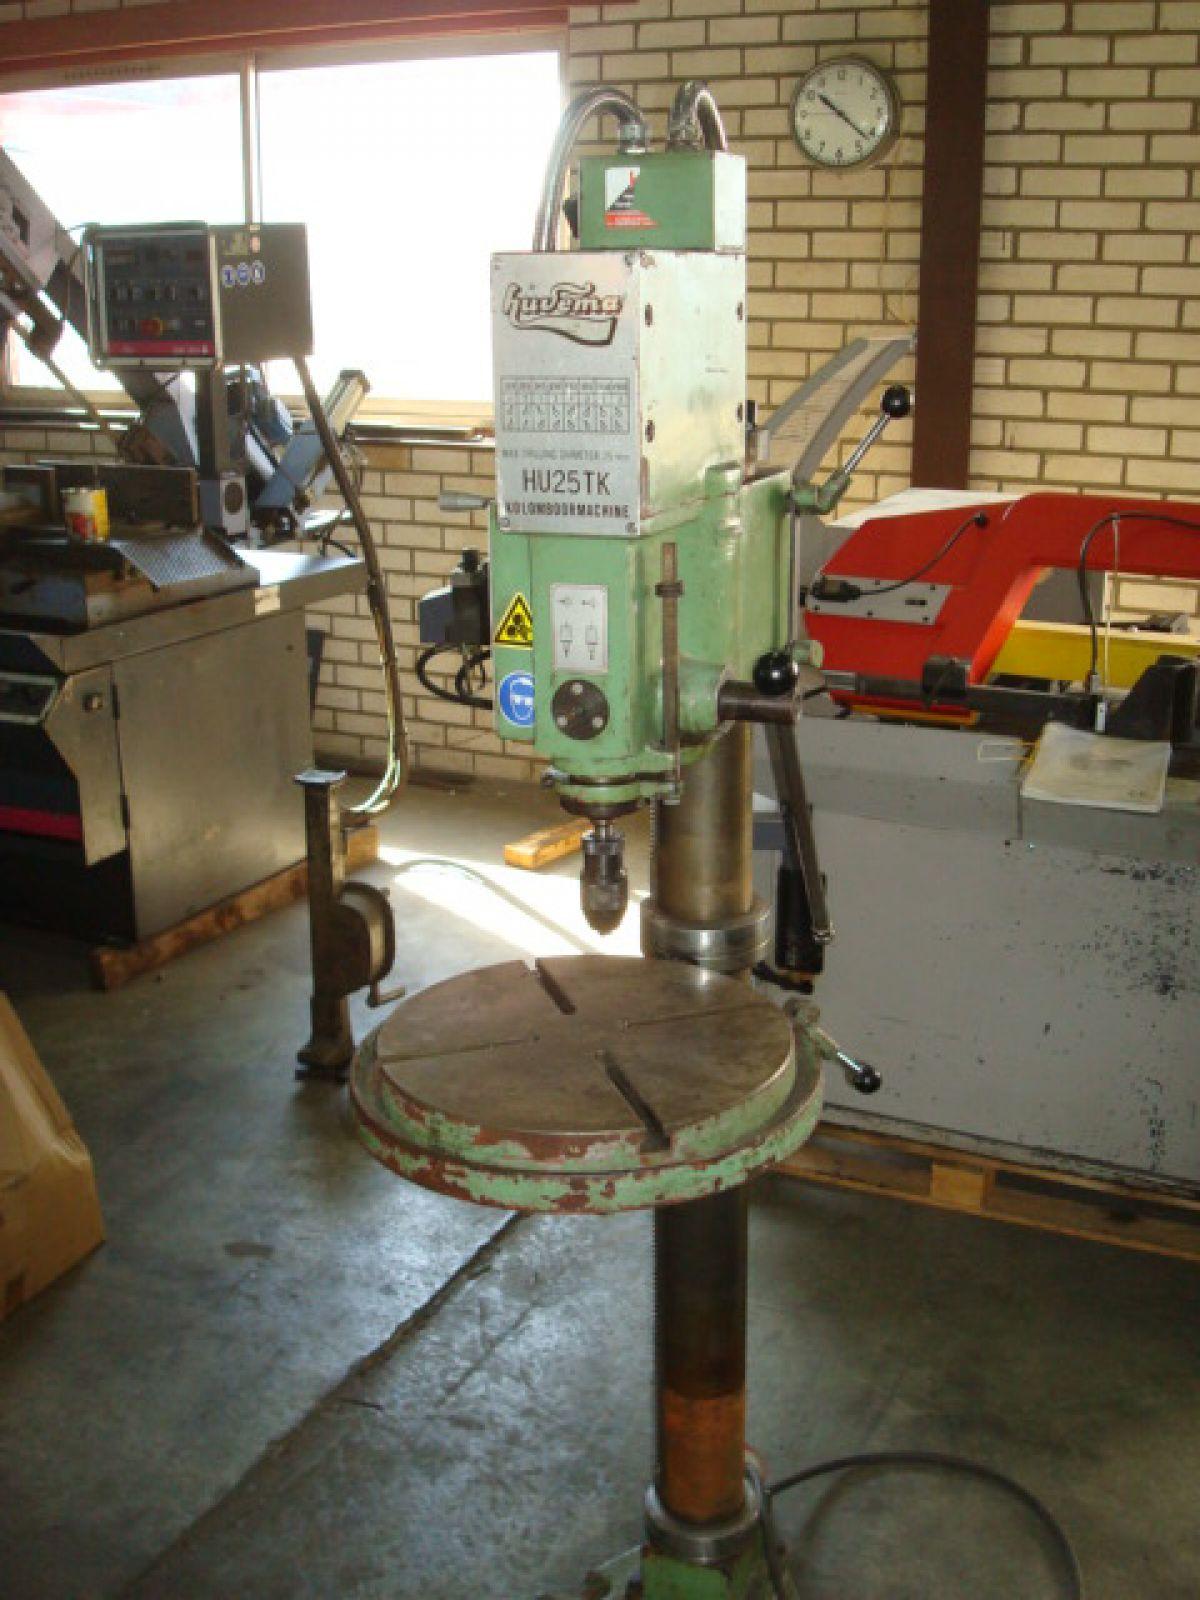 Huvema HU 25 TK - Drillingmachine